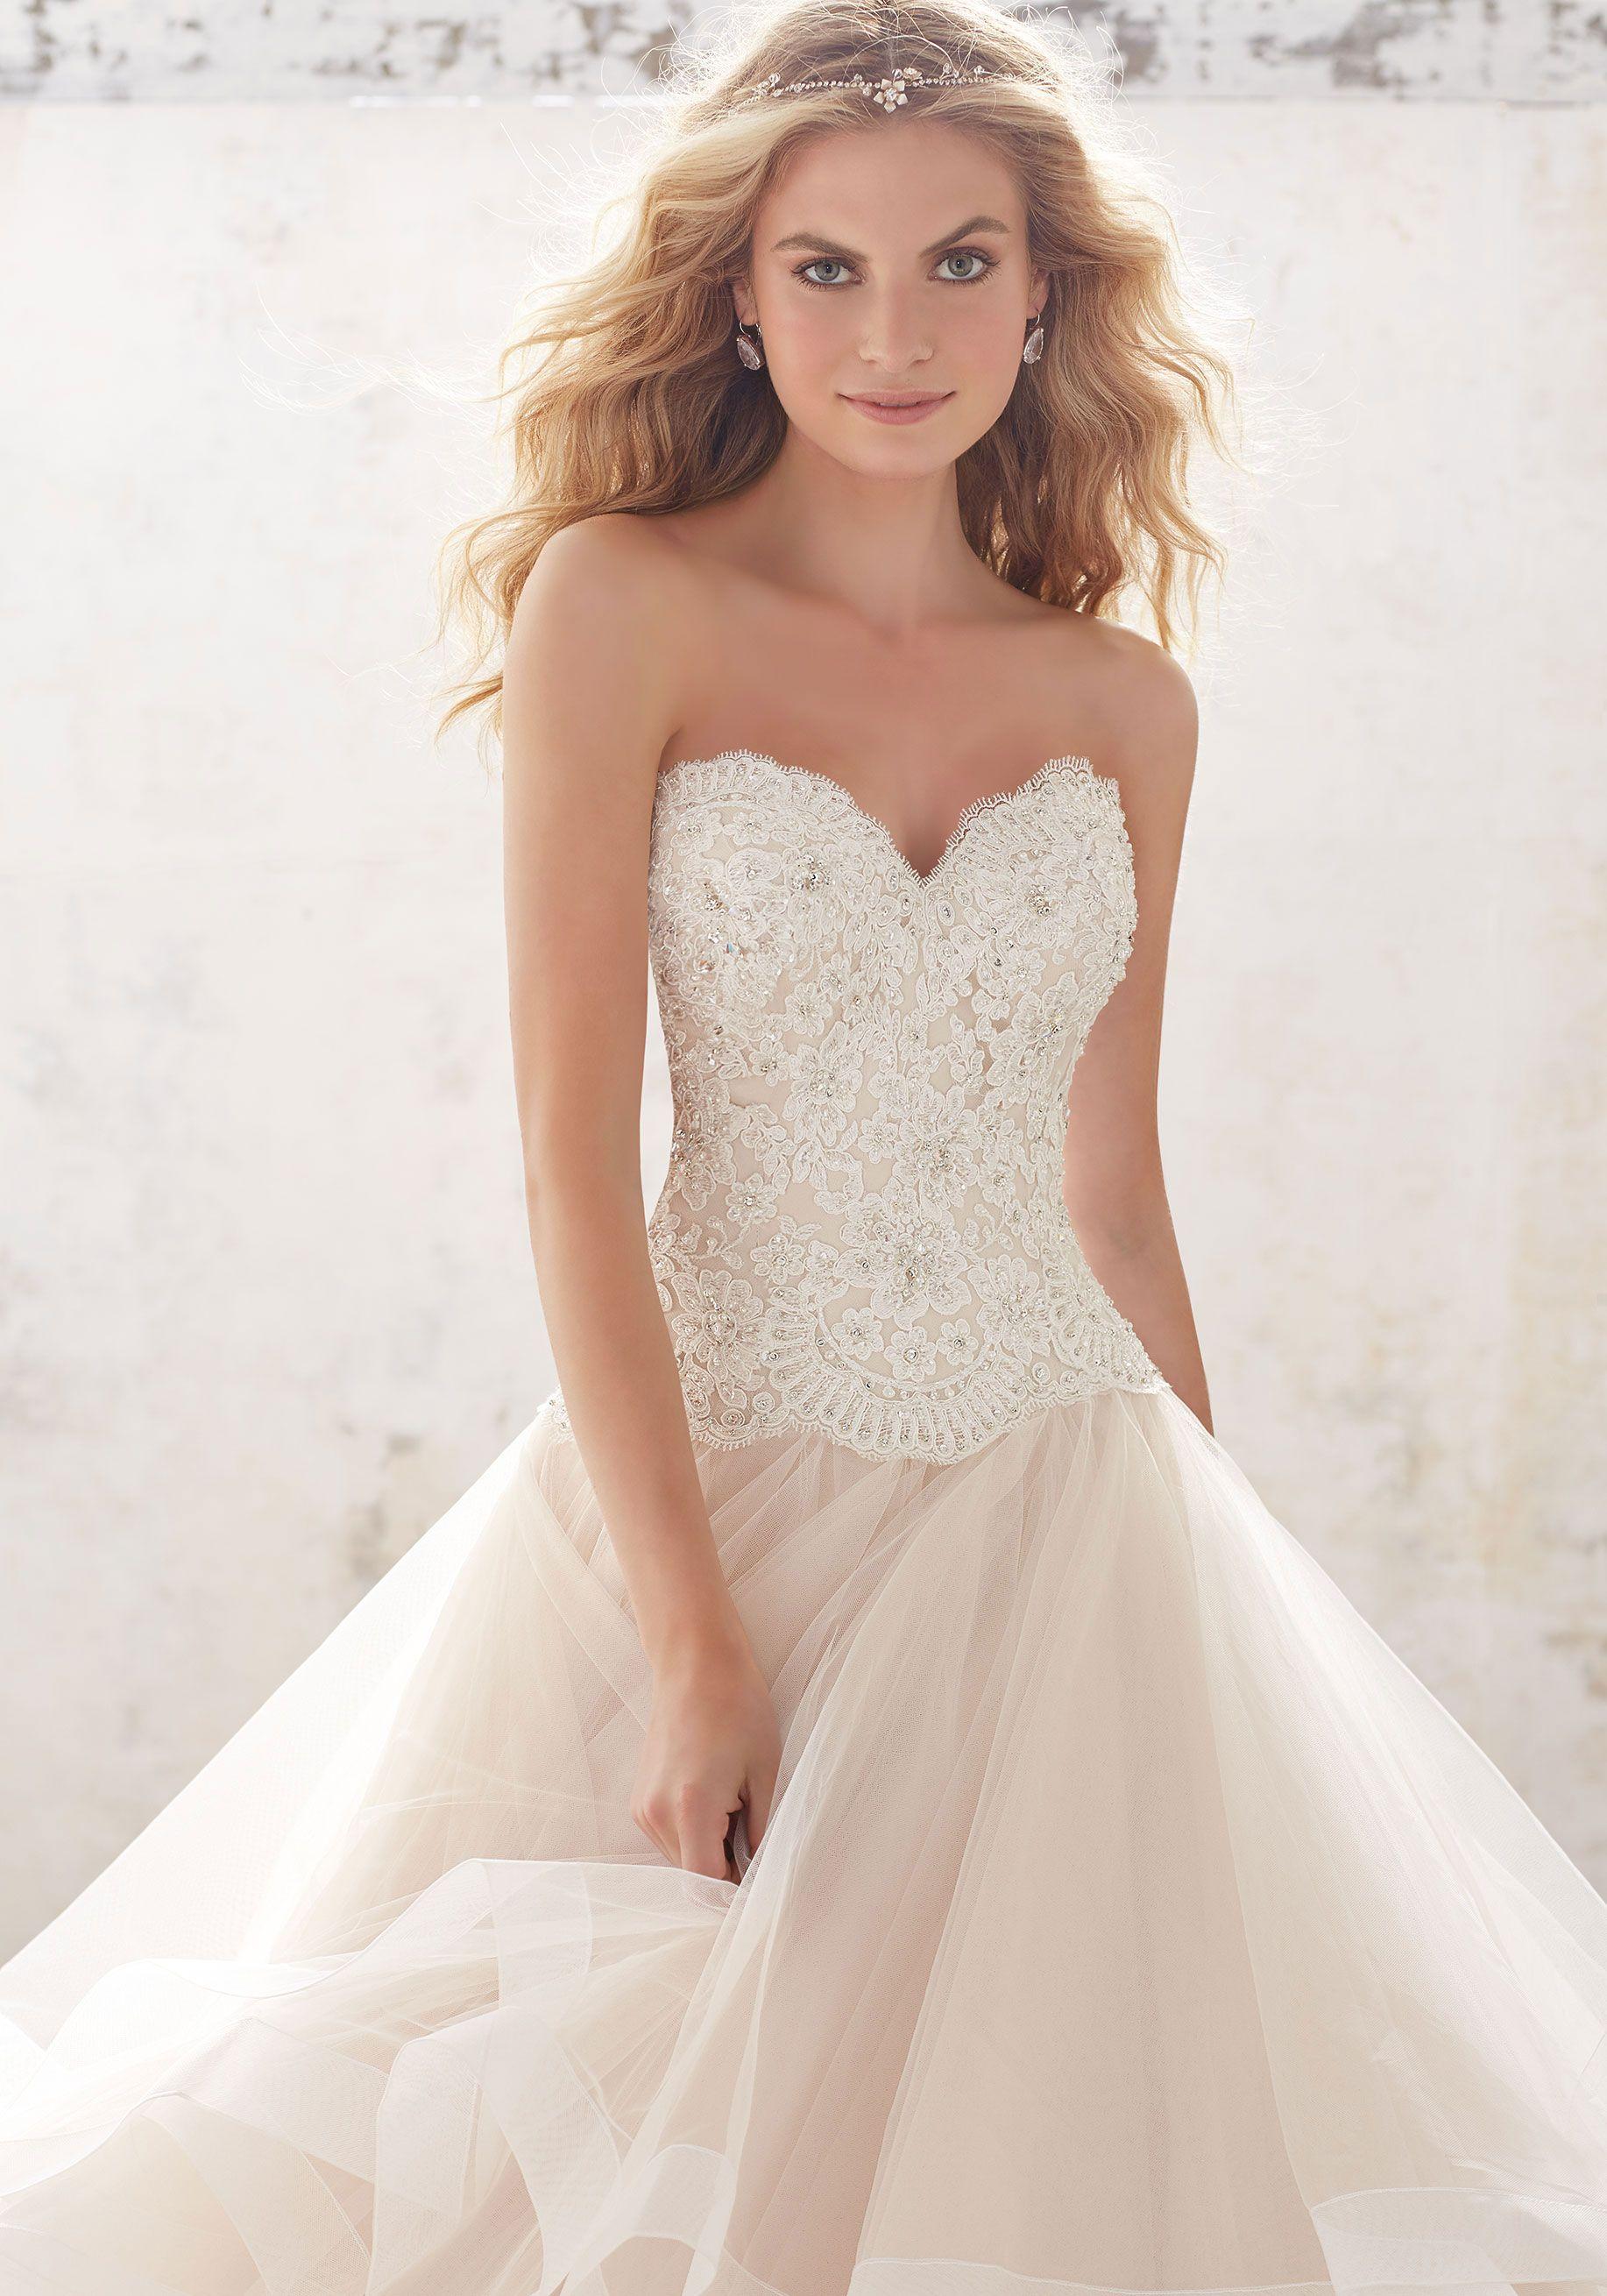 Mori lee madeline gardner wedding dress   Wedding Dresses and Bridal Gowns by Morilee designed by